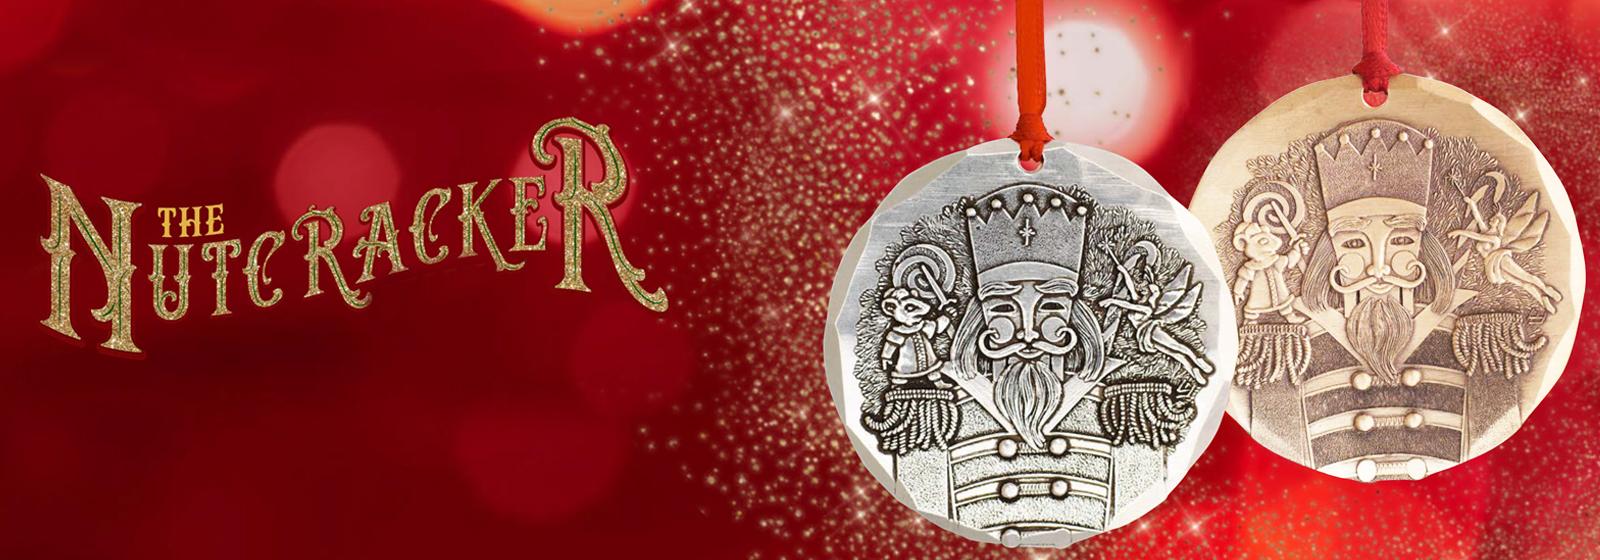 Christmas Nutcracker Ornament